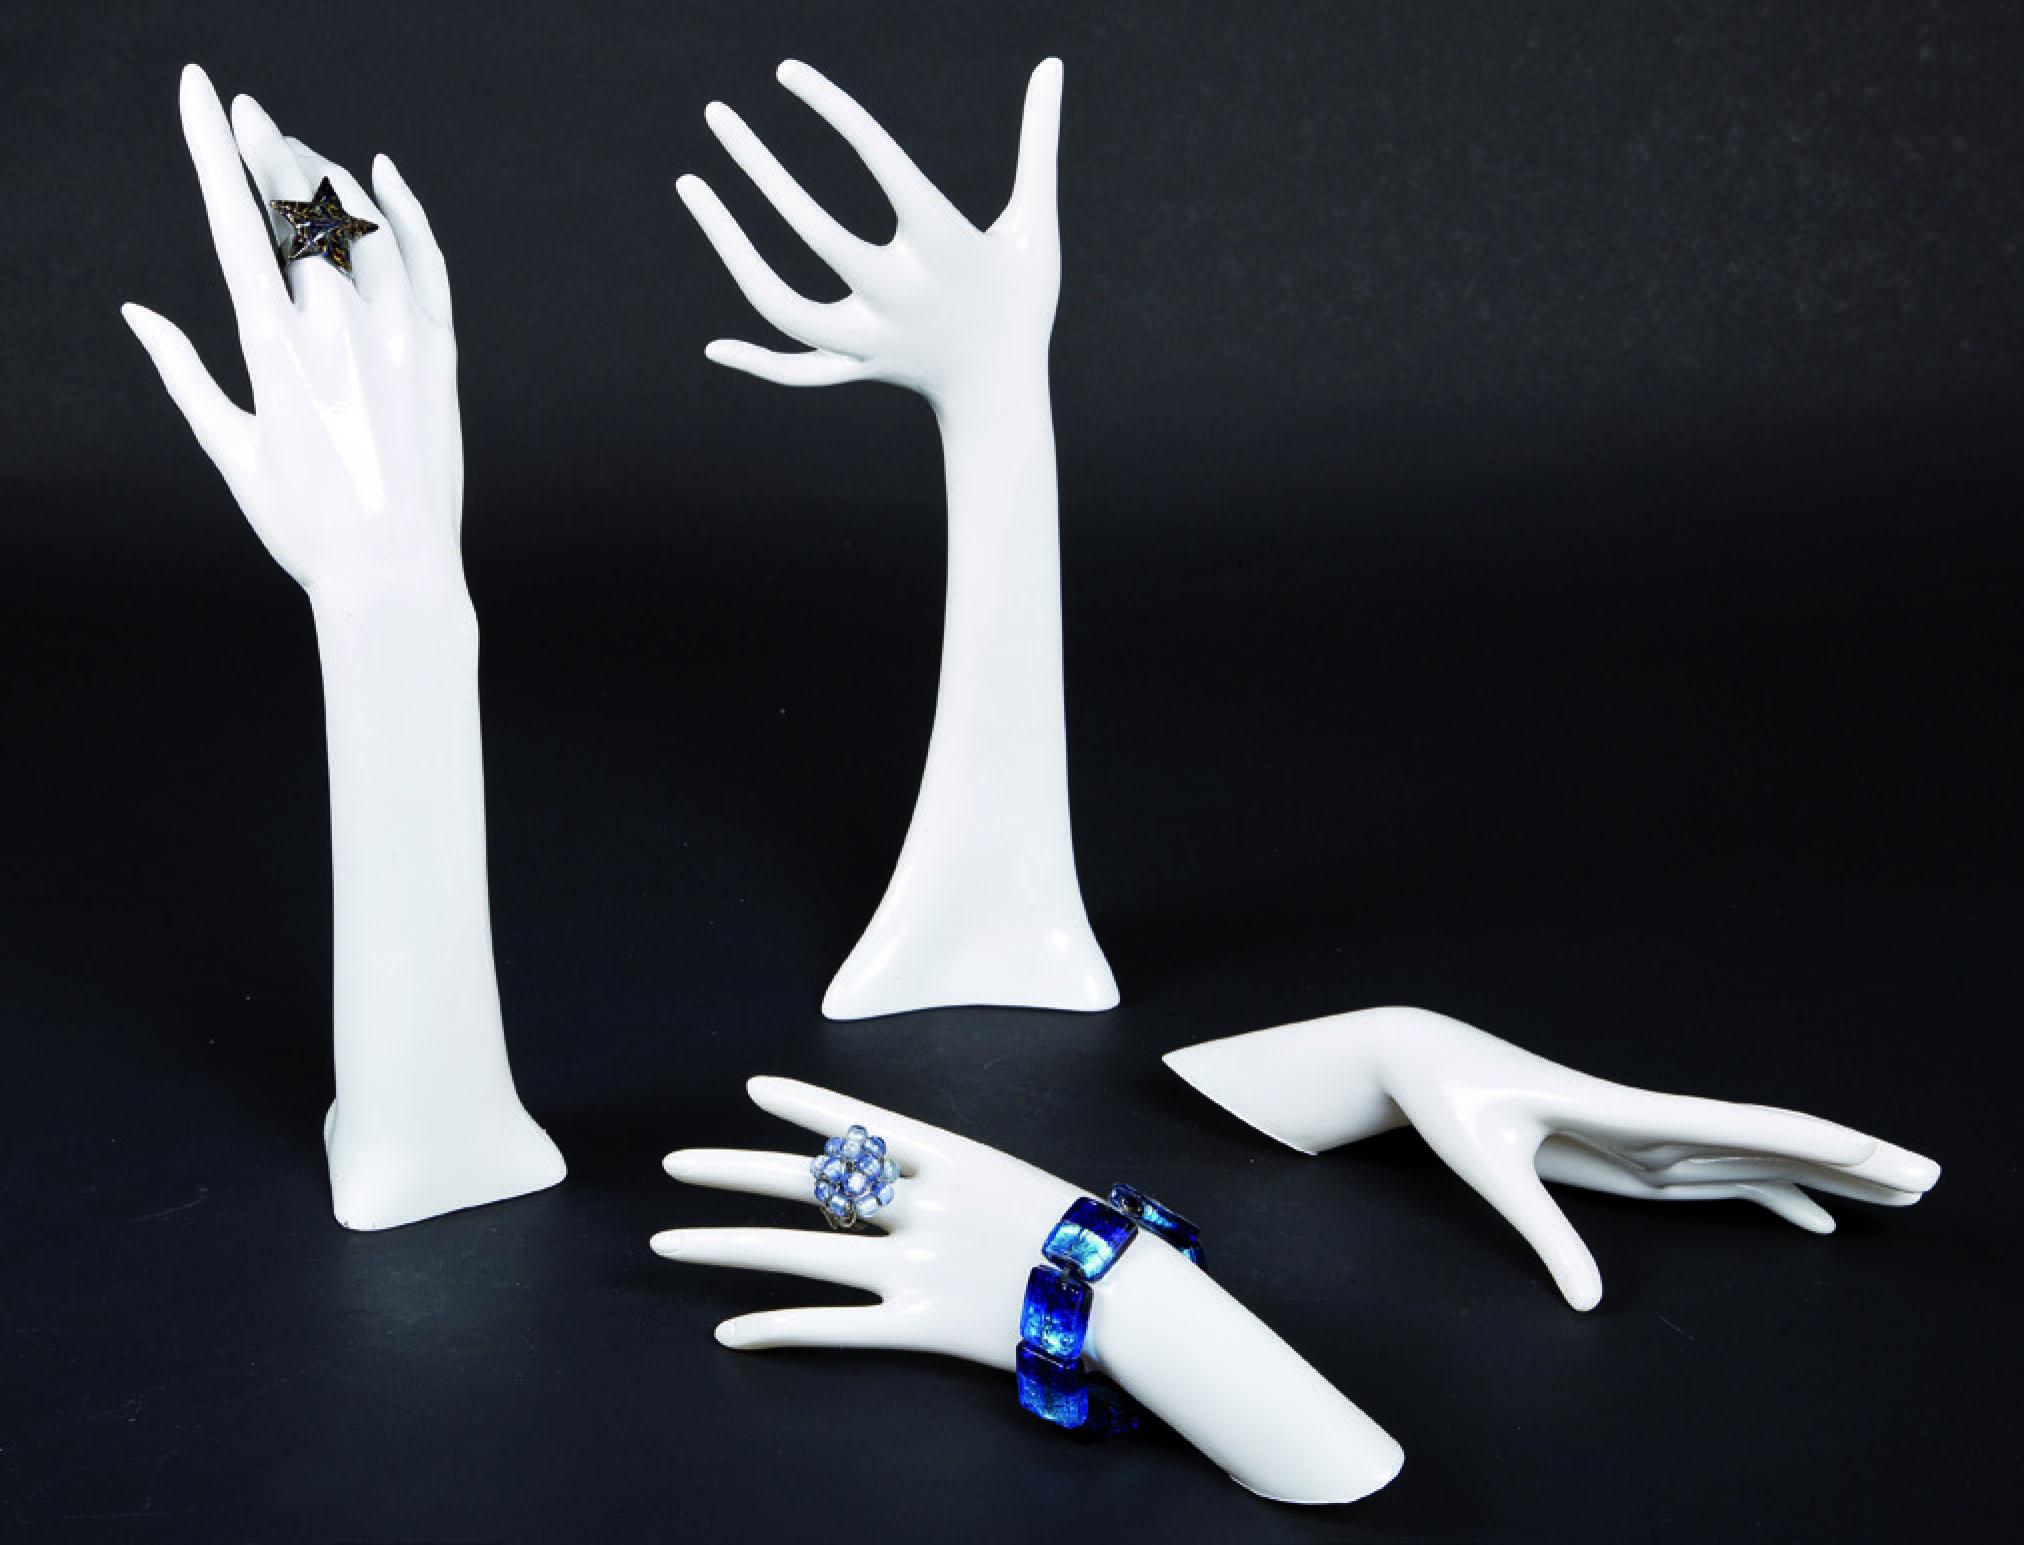 Jewellery, costume jewellery and glove display hands